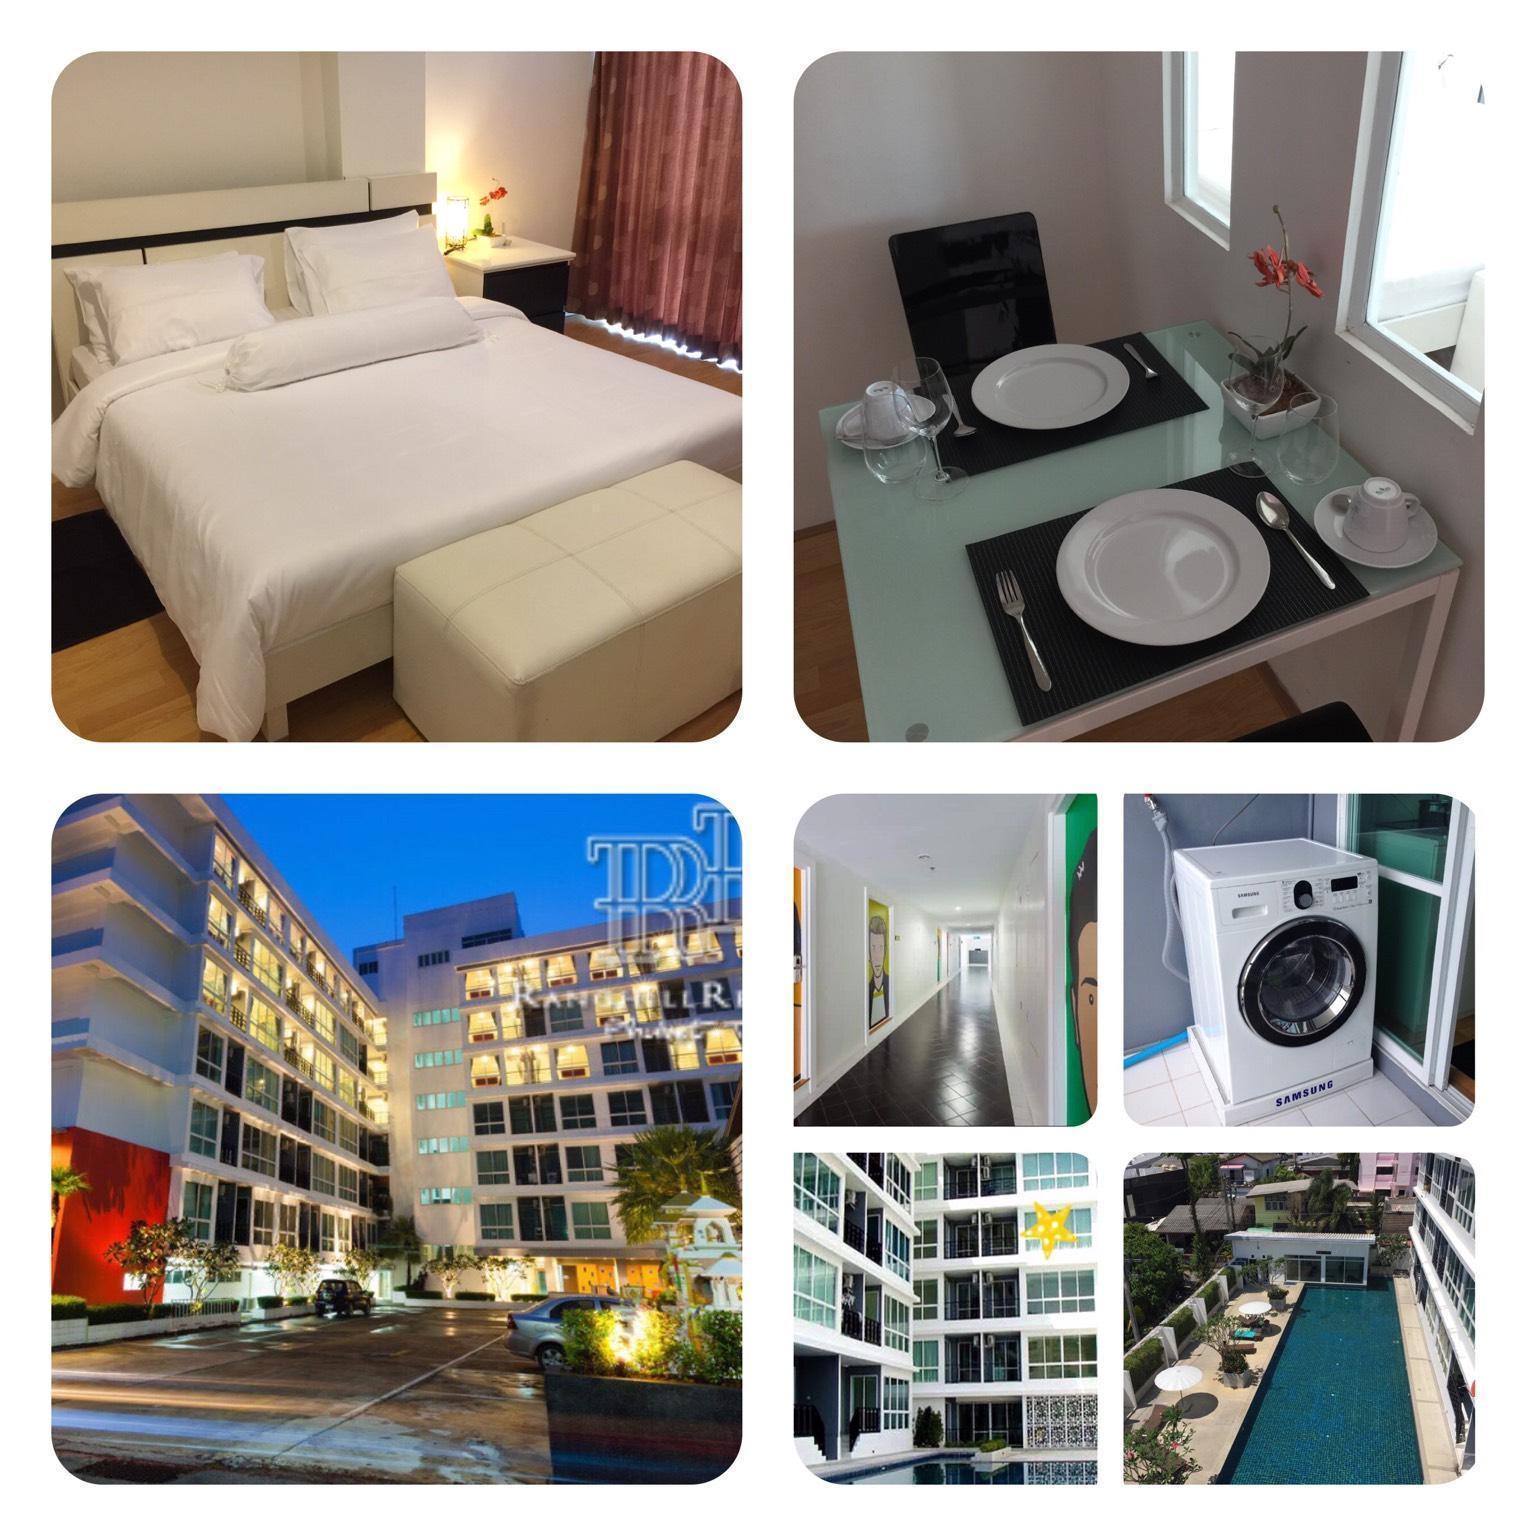 Apartment in  Ranghill Residences Phuket สตูดิโอ อพาร์ตเมนต์ 1 ห้องน้ำส่วนตัว ขนาด 45 ตร.ม. – ตัวเมืองภูเก็ต